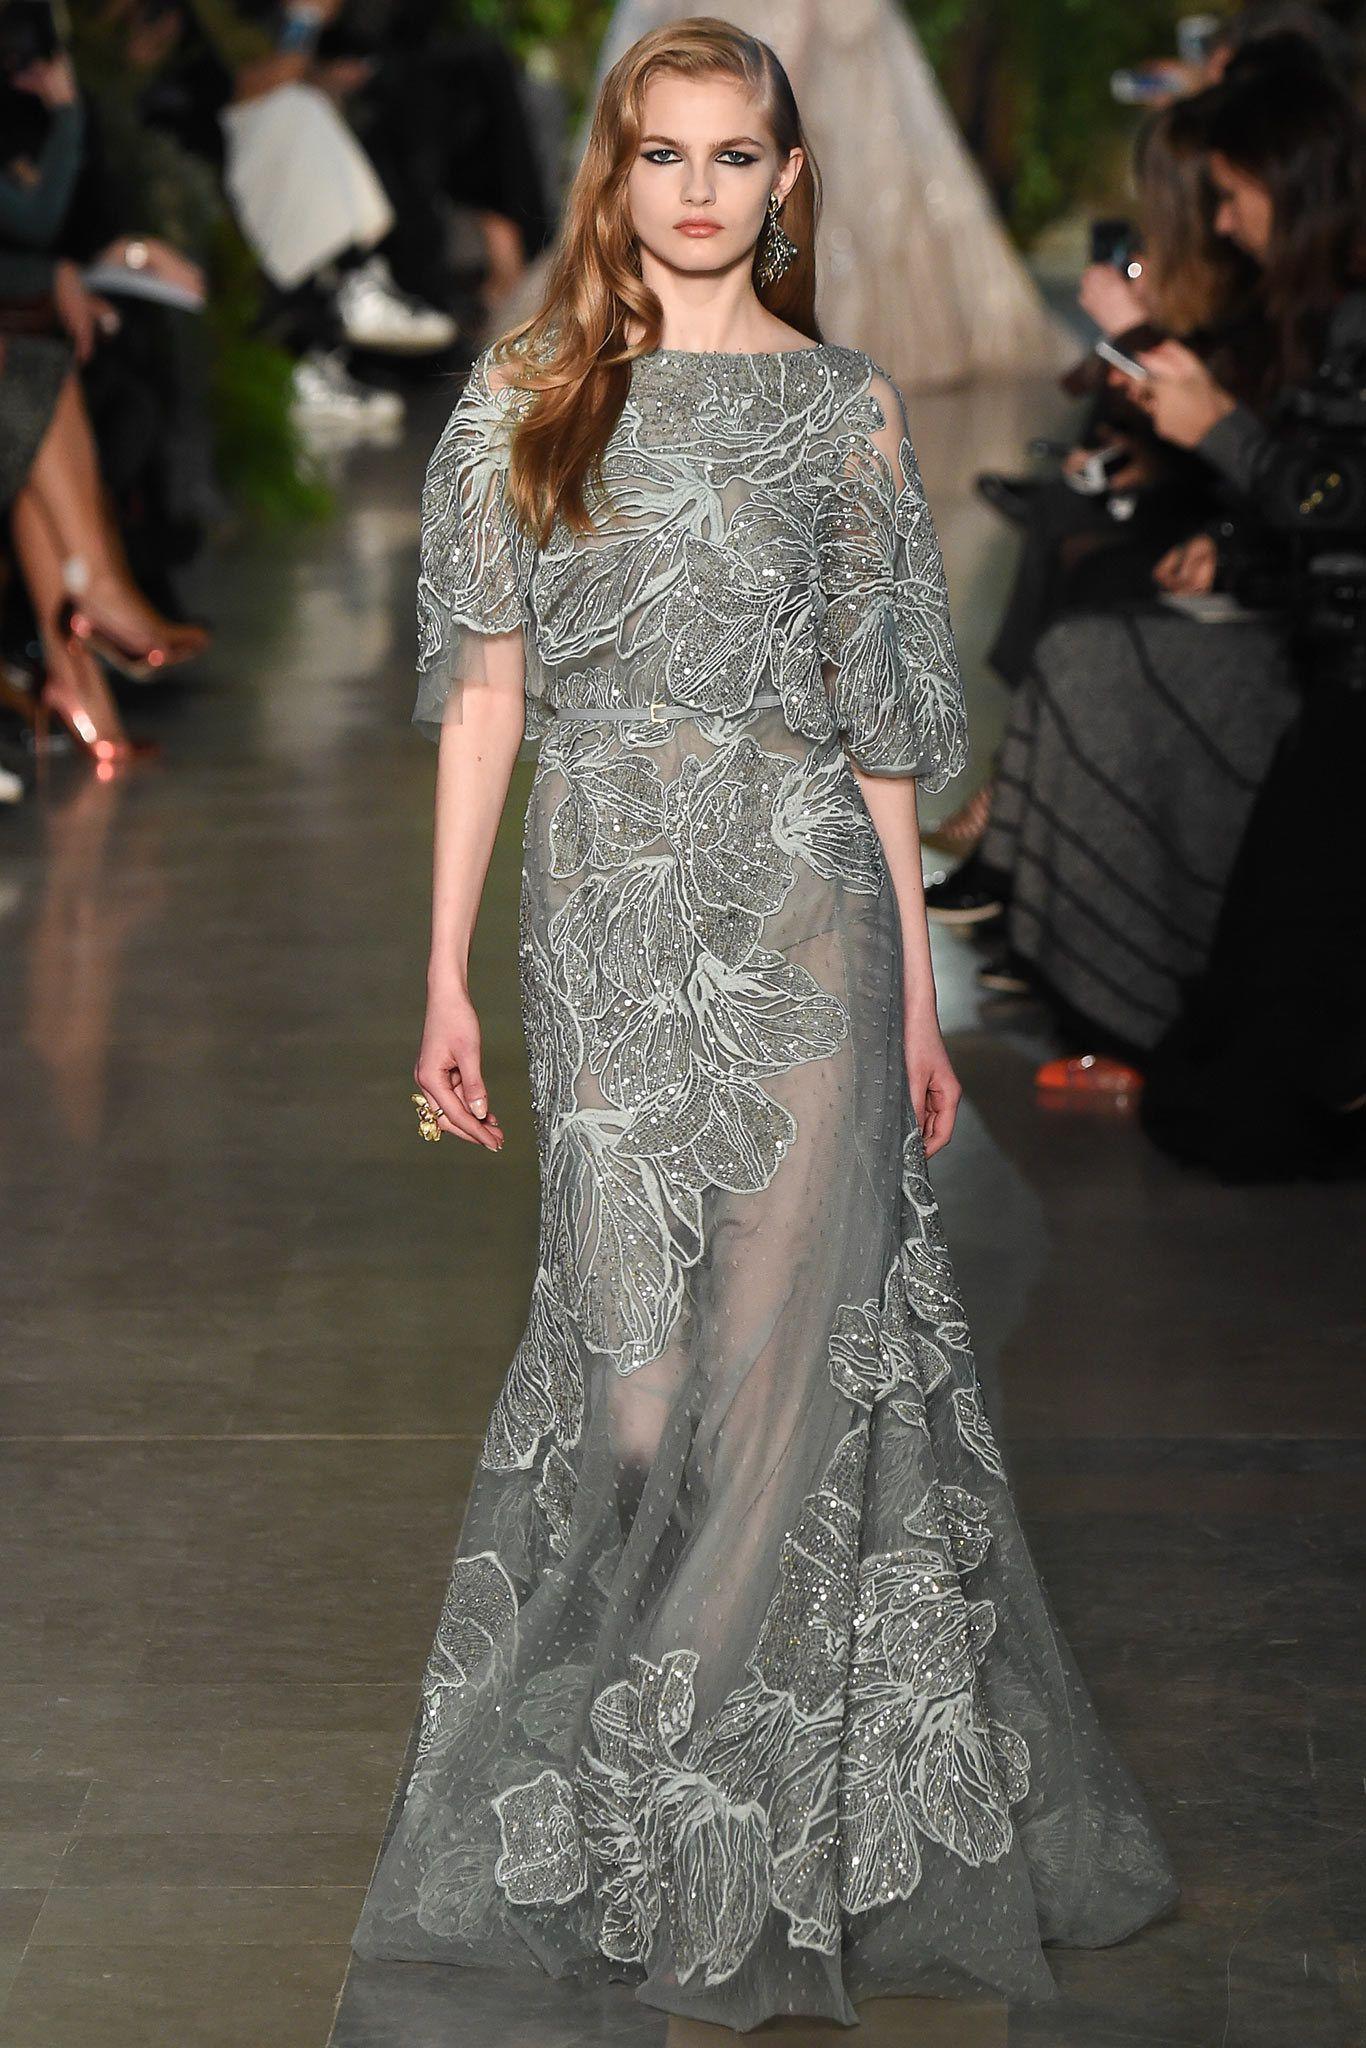 Elie Saab Spring 2015 Couture Fashion Show | Elie saab couture, Elie saab  spring, Elie saab